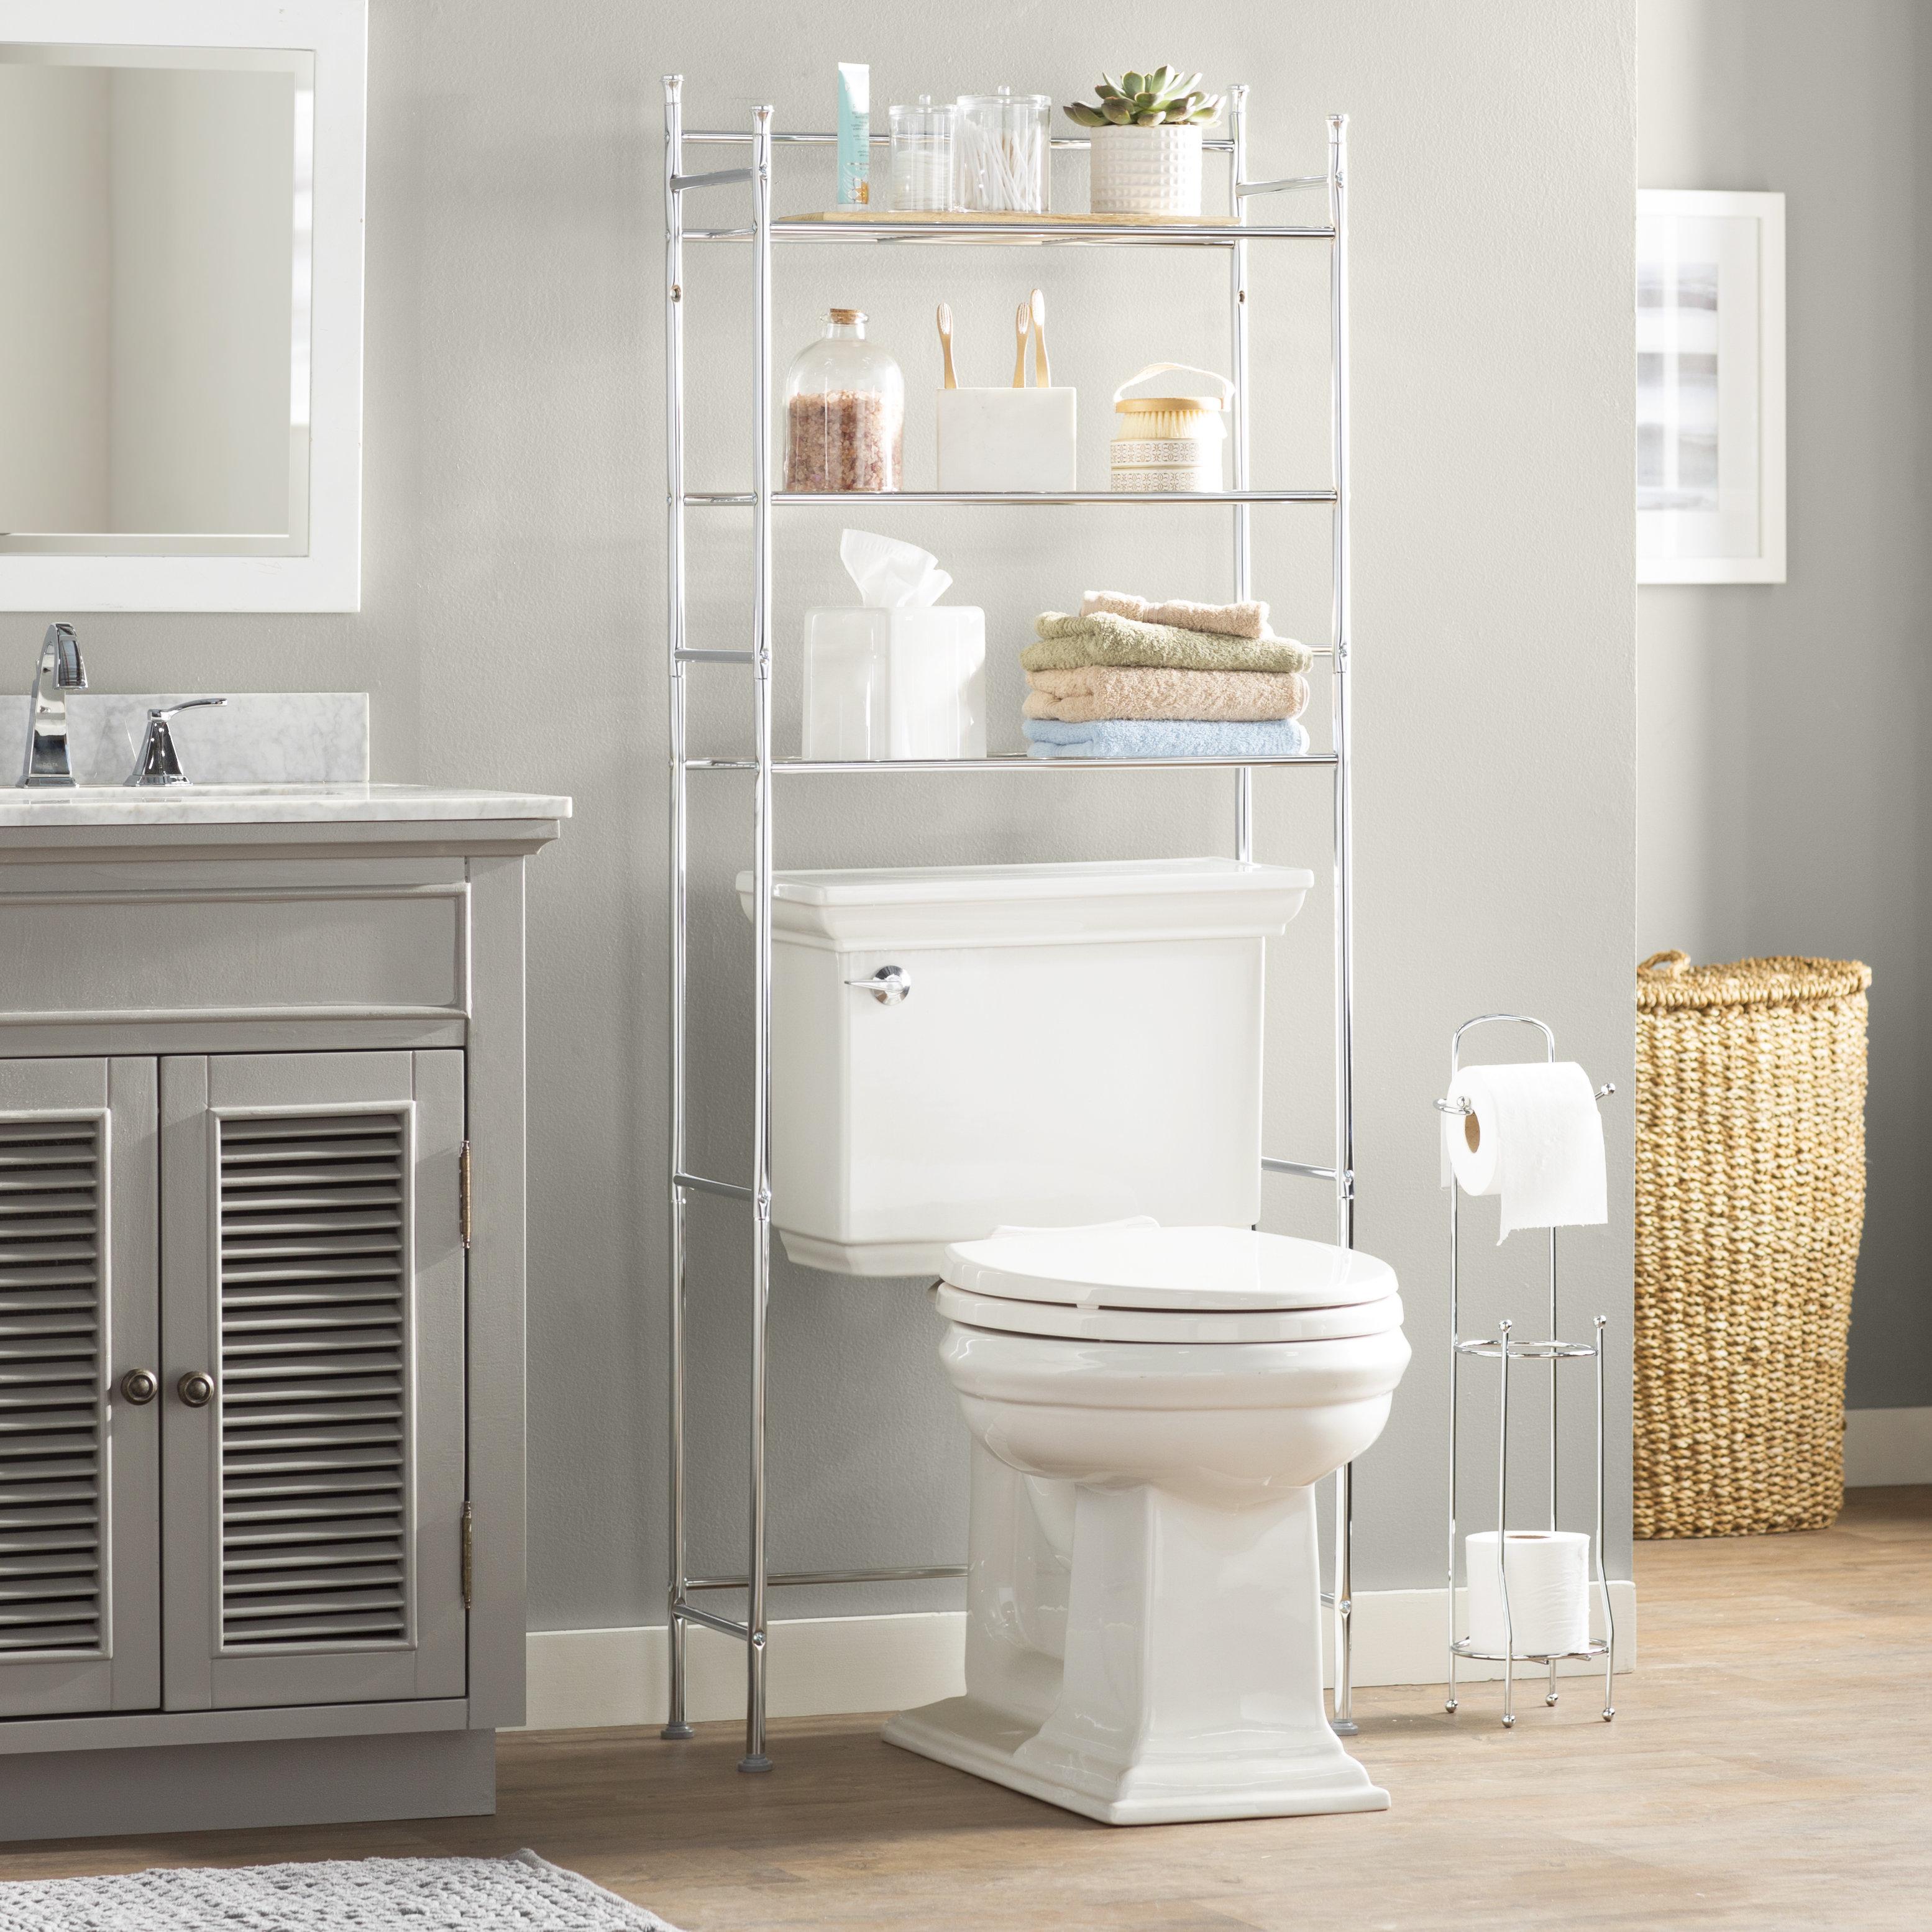 Wayfair Basics 2283 W X 5984 H Over The Toilet Storage inside measurements 3109 X 3109